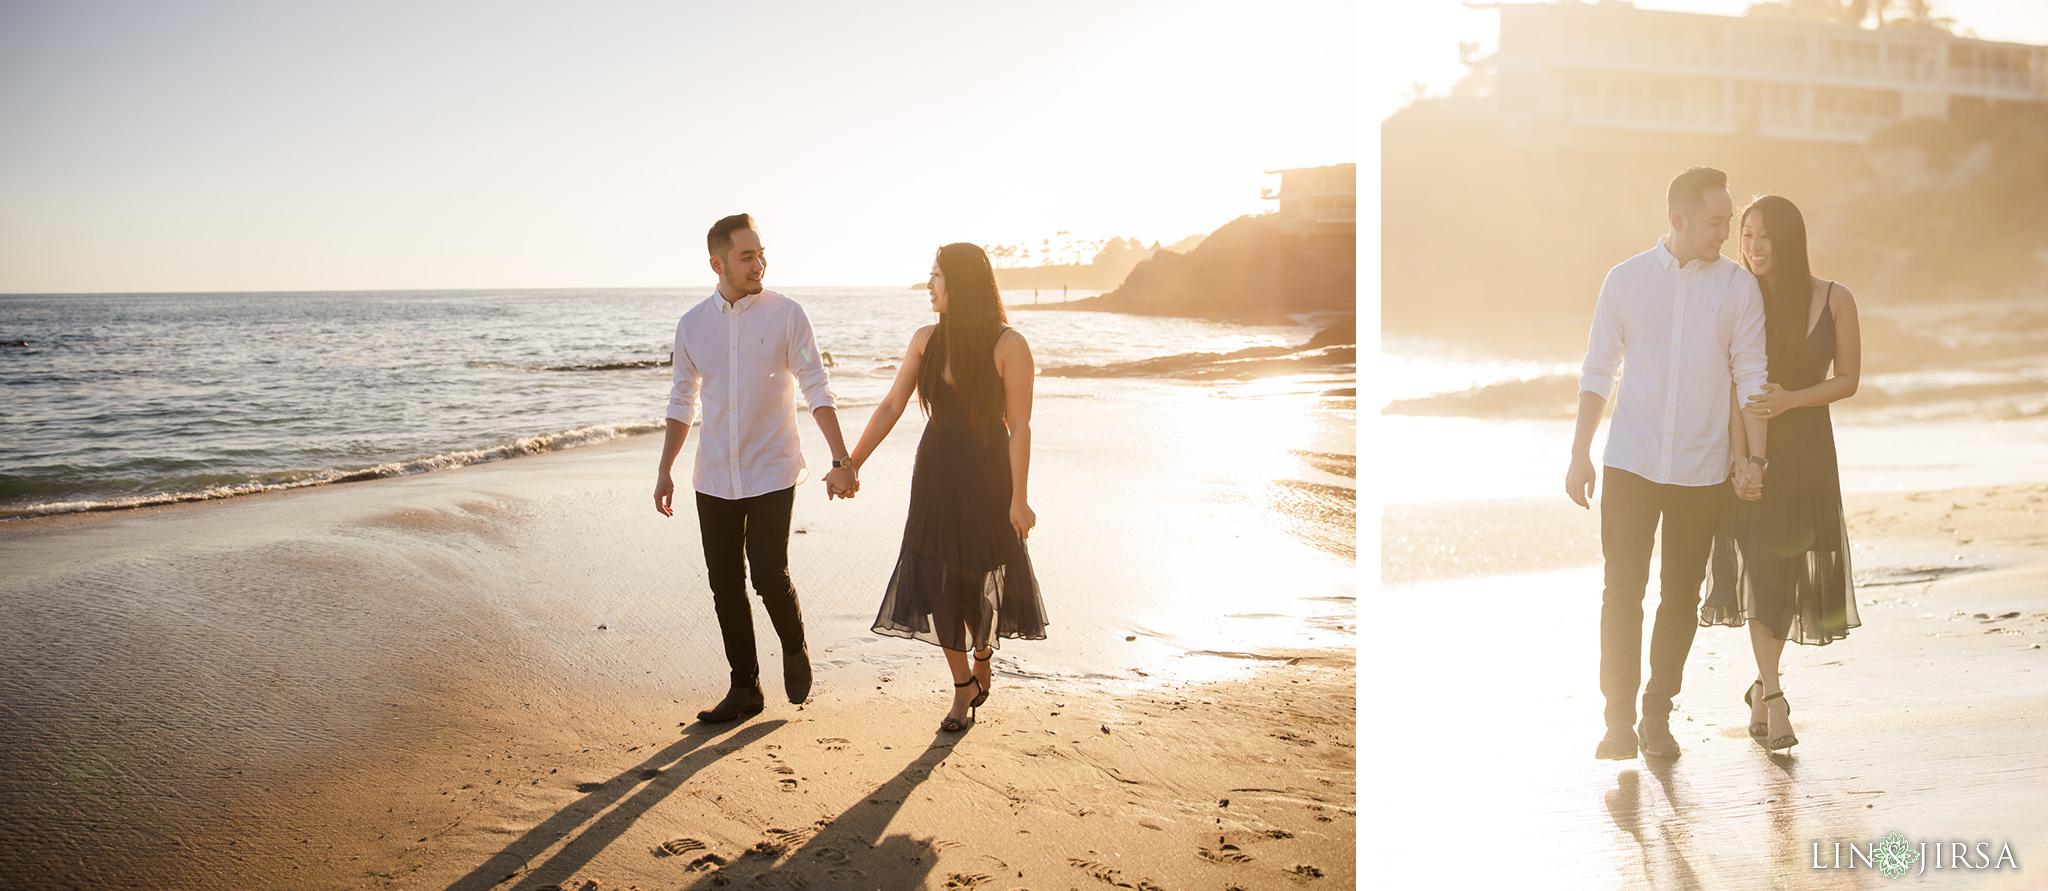 05 Heisler Beach Orange County Proposal Engagement Photography